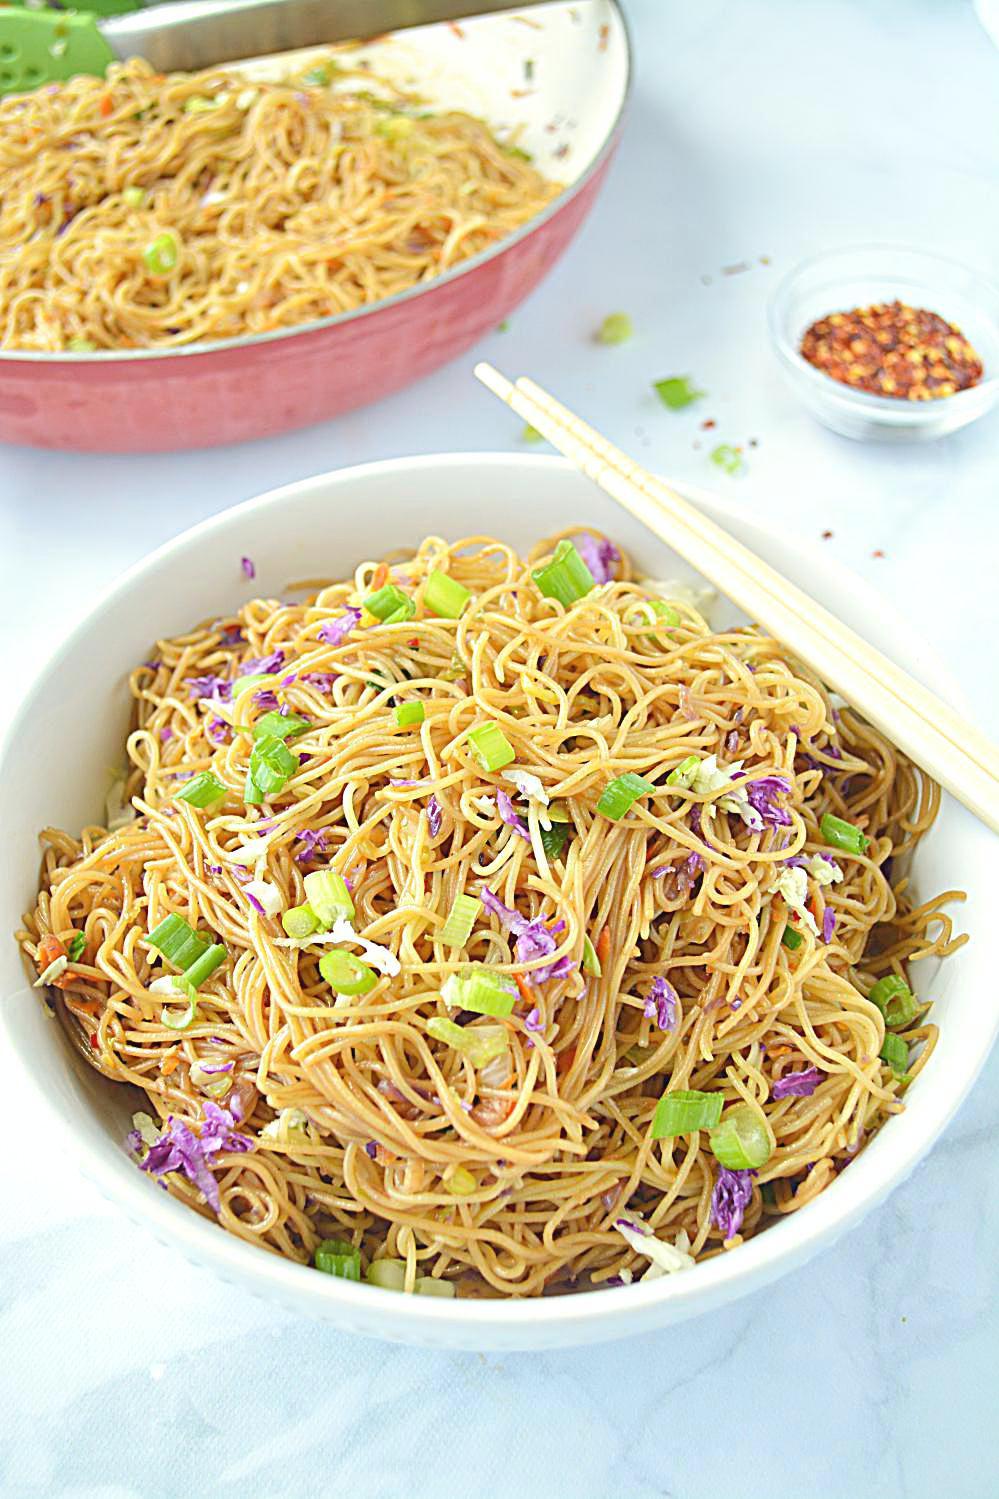 Cantonese Style Veg Noodles recipe